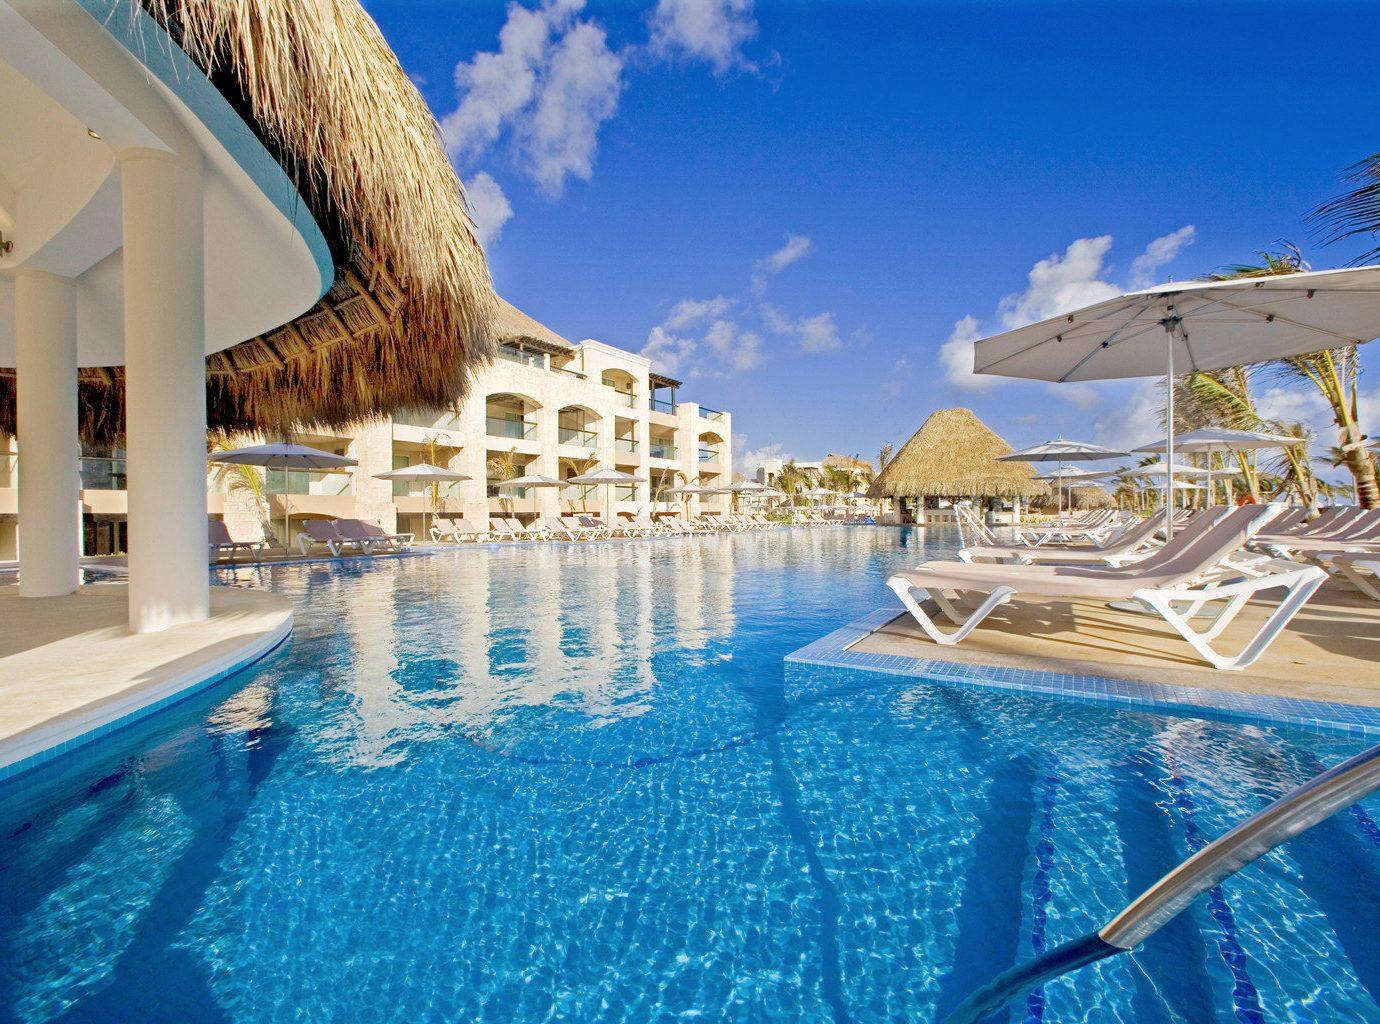 Pool at Hard Rock Hotel & Casino Punta Cana, Dominican Republic